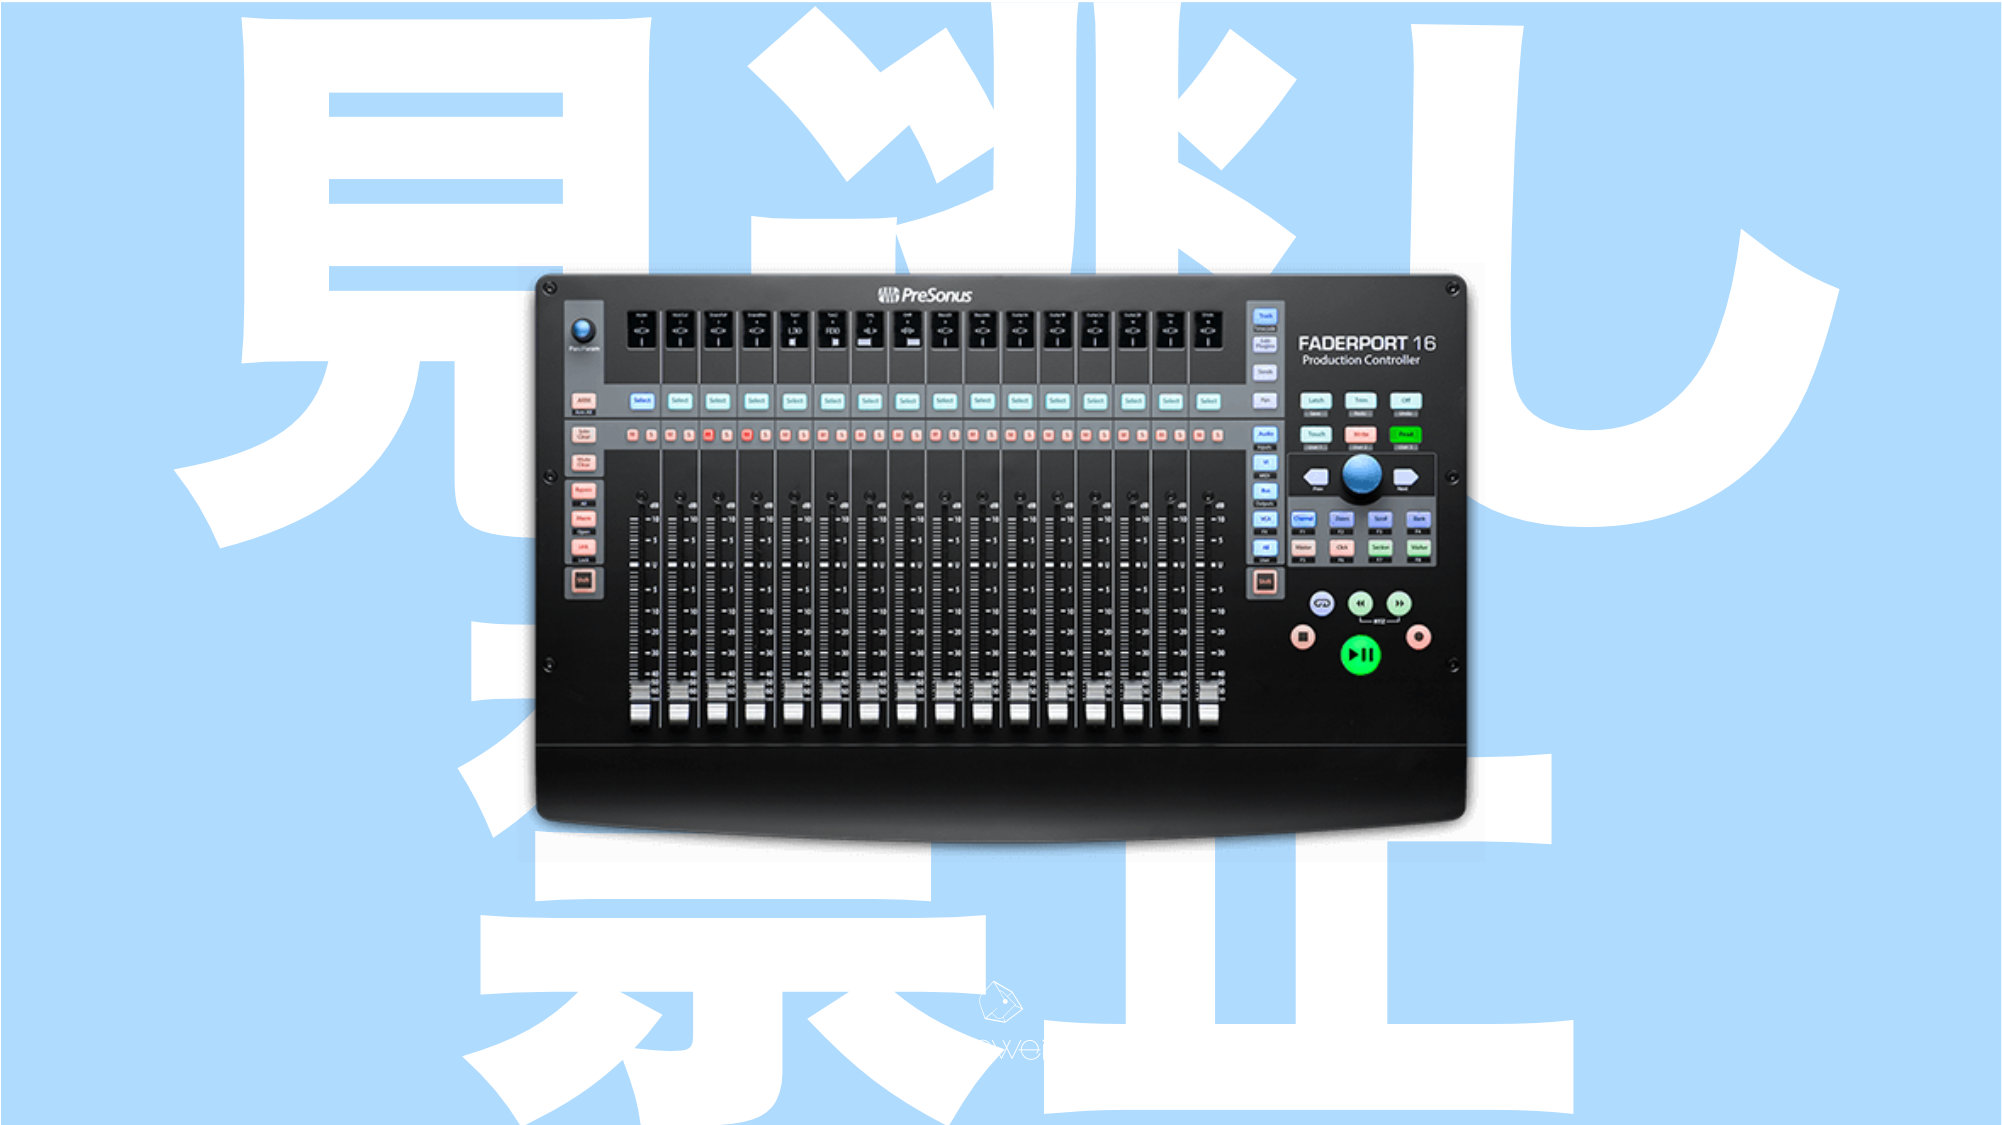 PreSonus FadePort 在控制器這部分算是做的比較有聲有色的產品之一